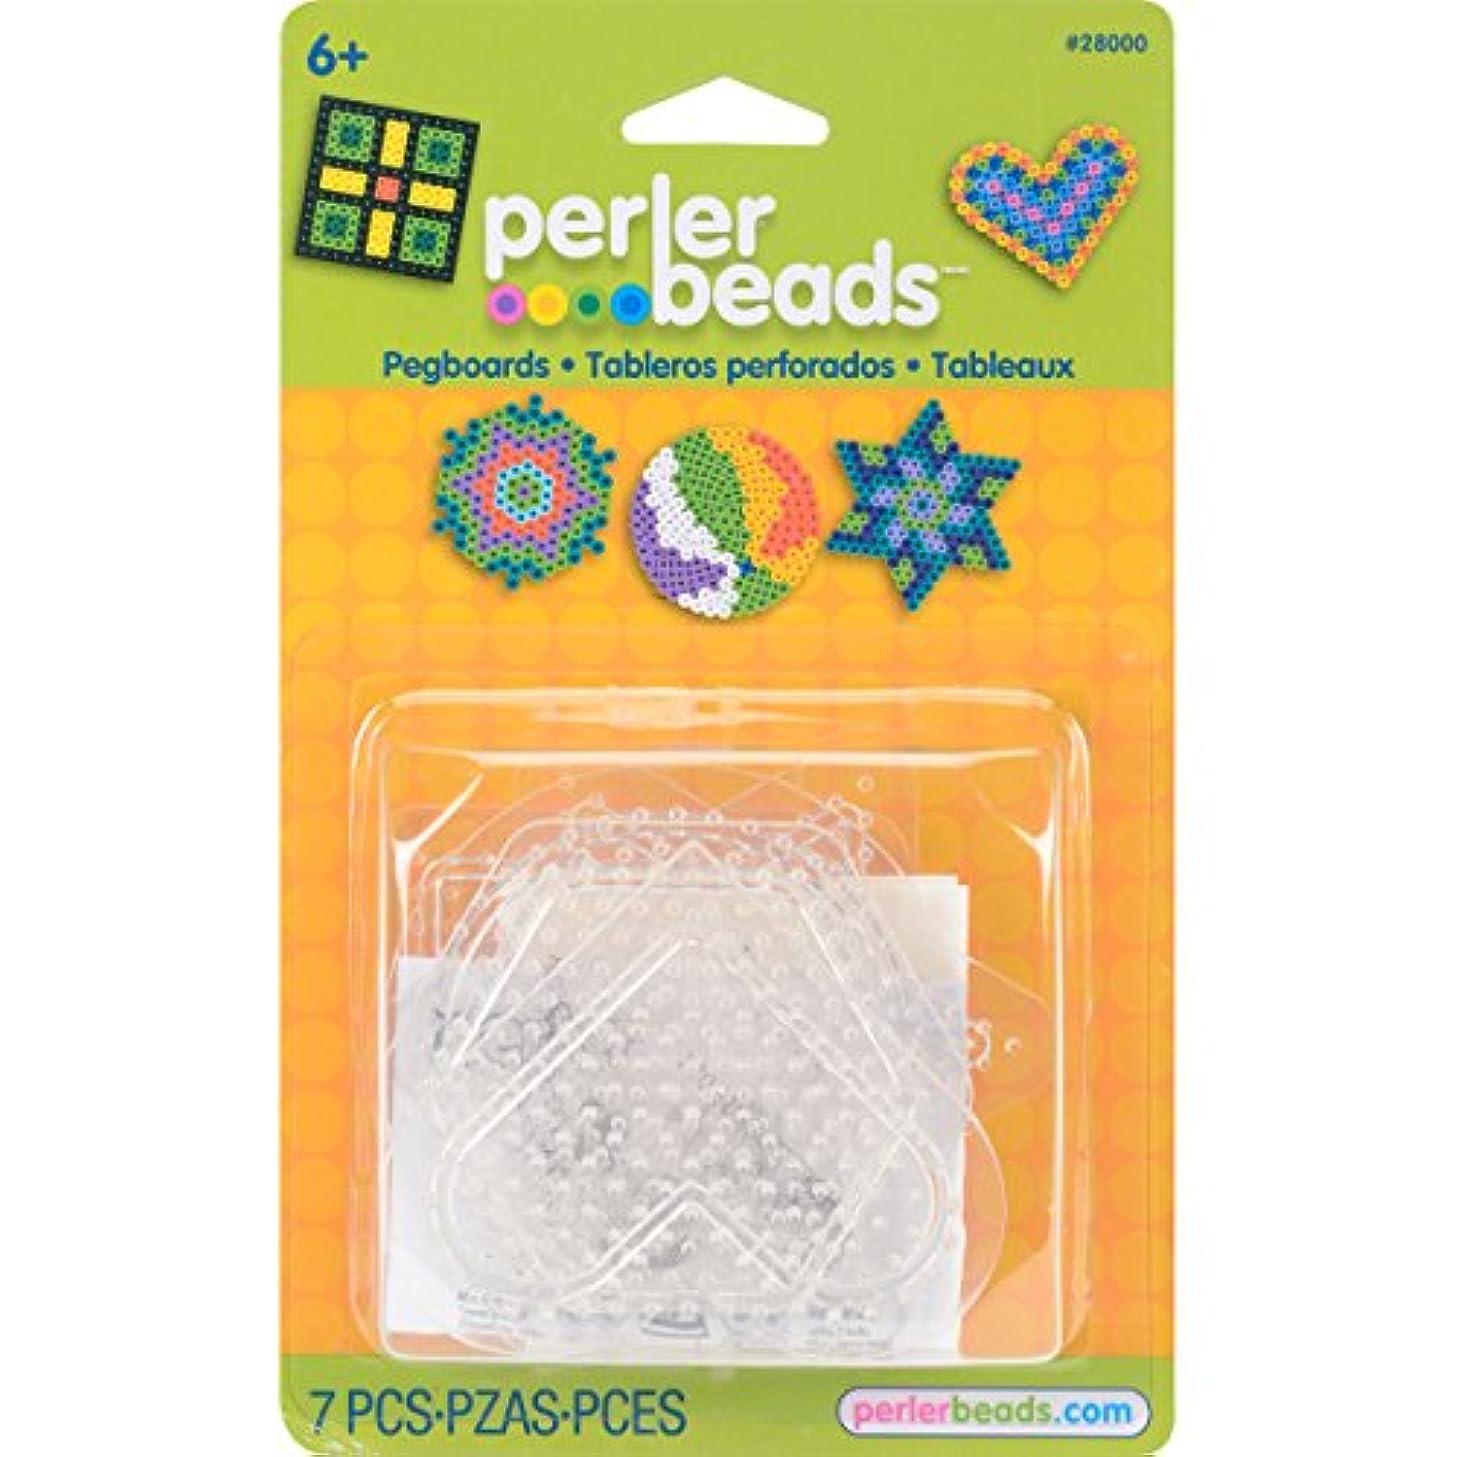 Perler Beads Basic Shapes Clear Pegboard Set, 7 pcs